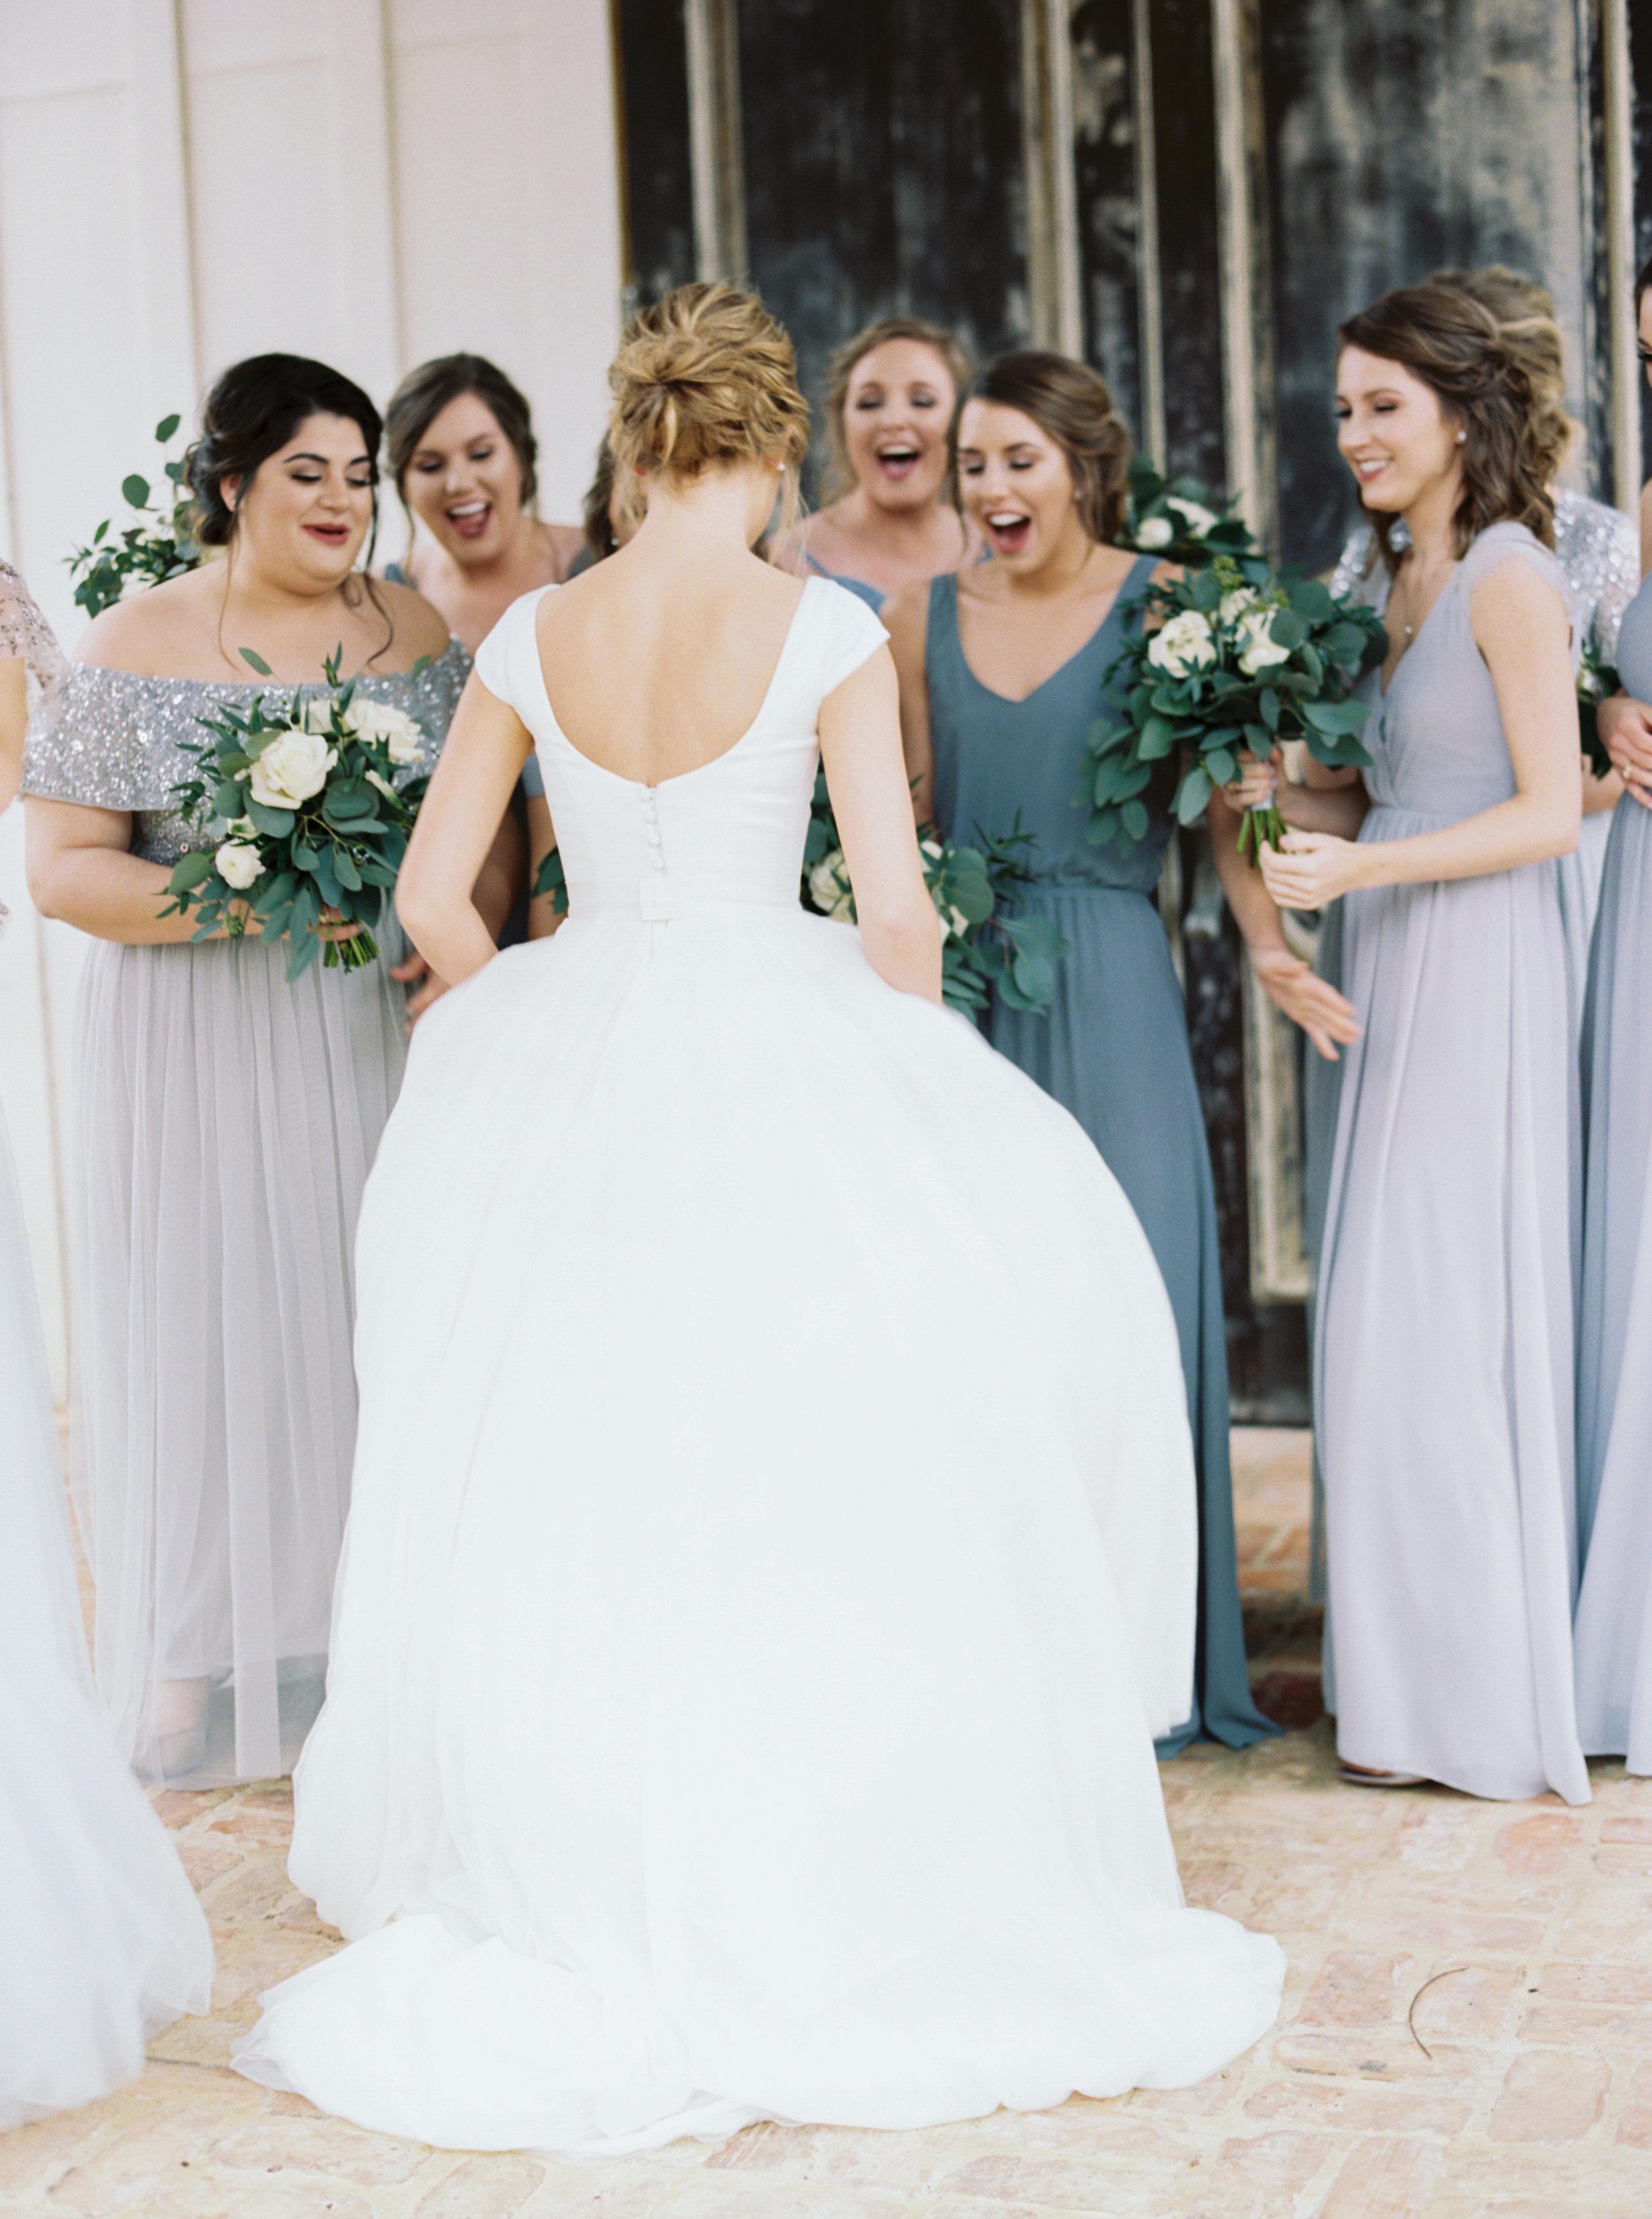 Winter Wedding, Neutral Wedding Palatte, Eucalyptus Bouquet, Cap Sleeve Dress, Rainy Wedding Day, Grey and Blue Wedding Colors, Charleston Wedding Venues, Charleston Wedding, Southern Wedding Inspiration